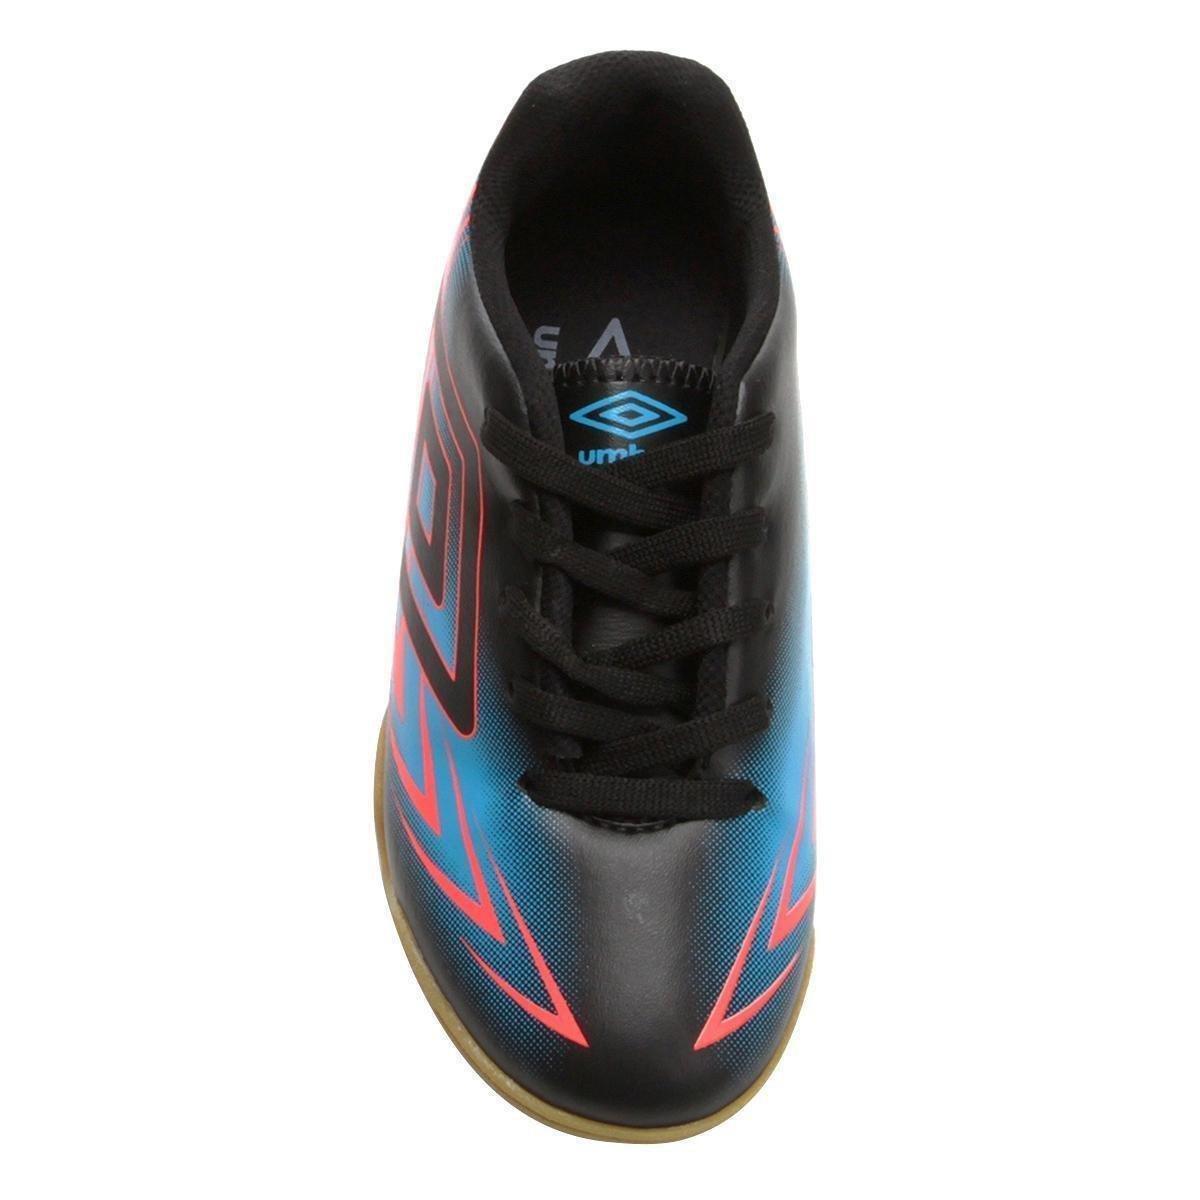 948ef95f30 Chuteira Futsal Infantil Umbro Speed III - Compre Agora